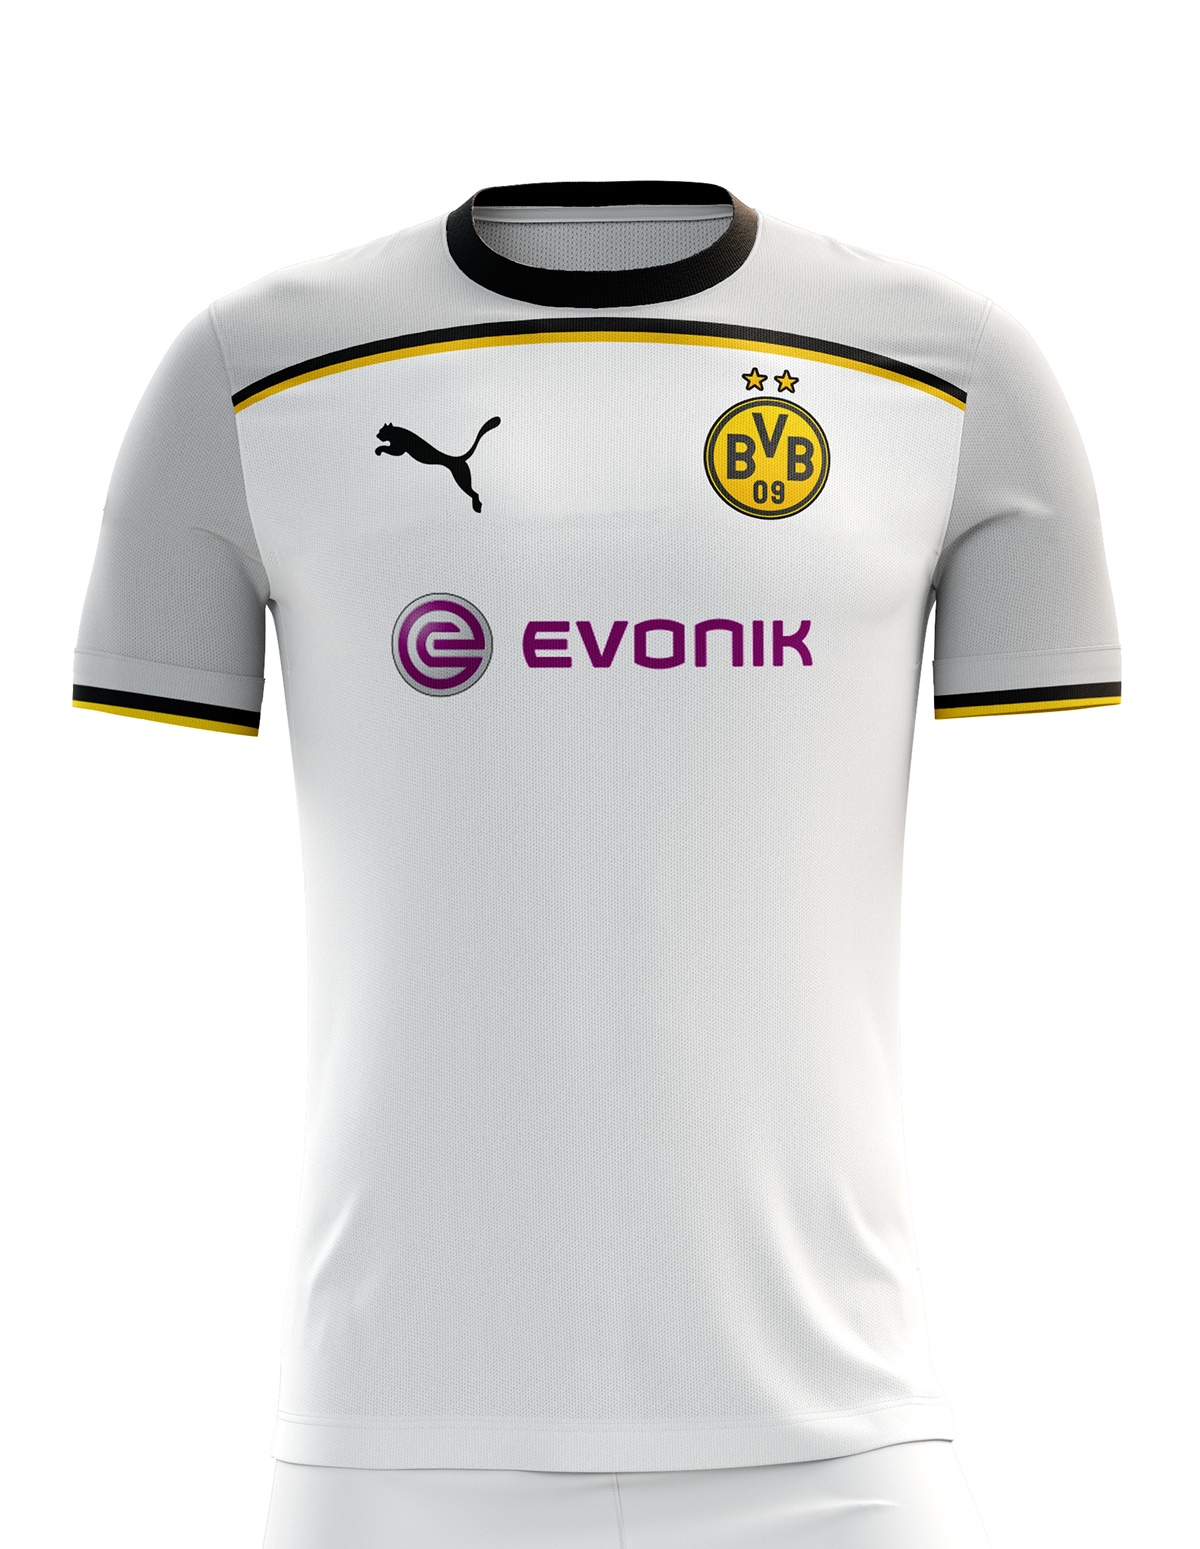 Borussia Dortmund Football Kit 17/18. on Behance